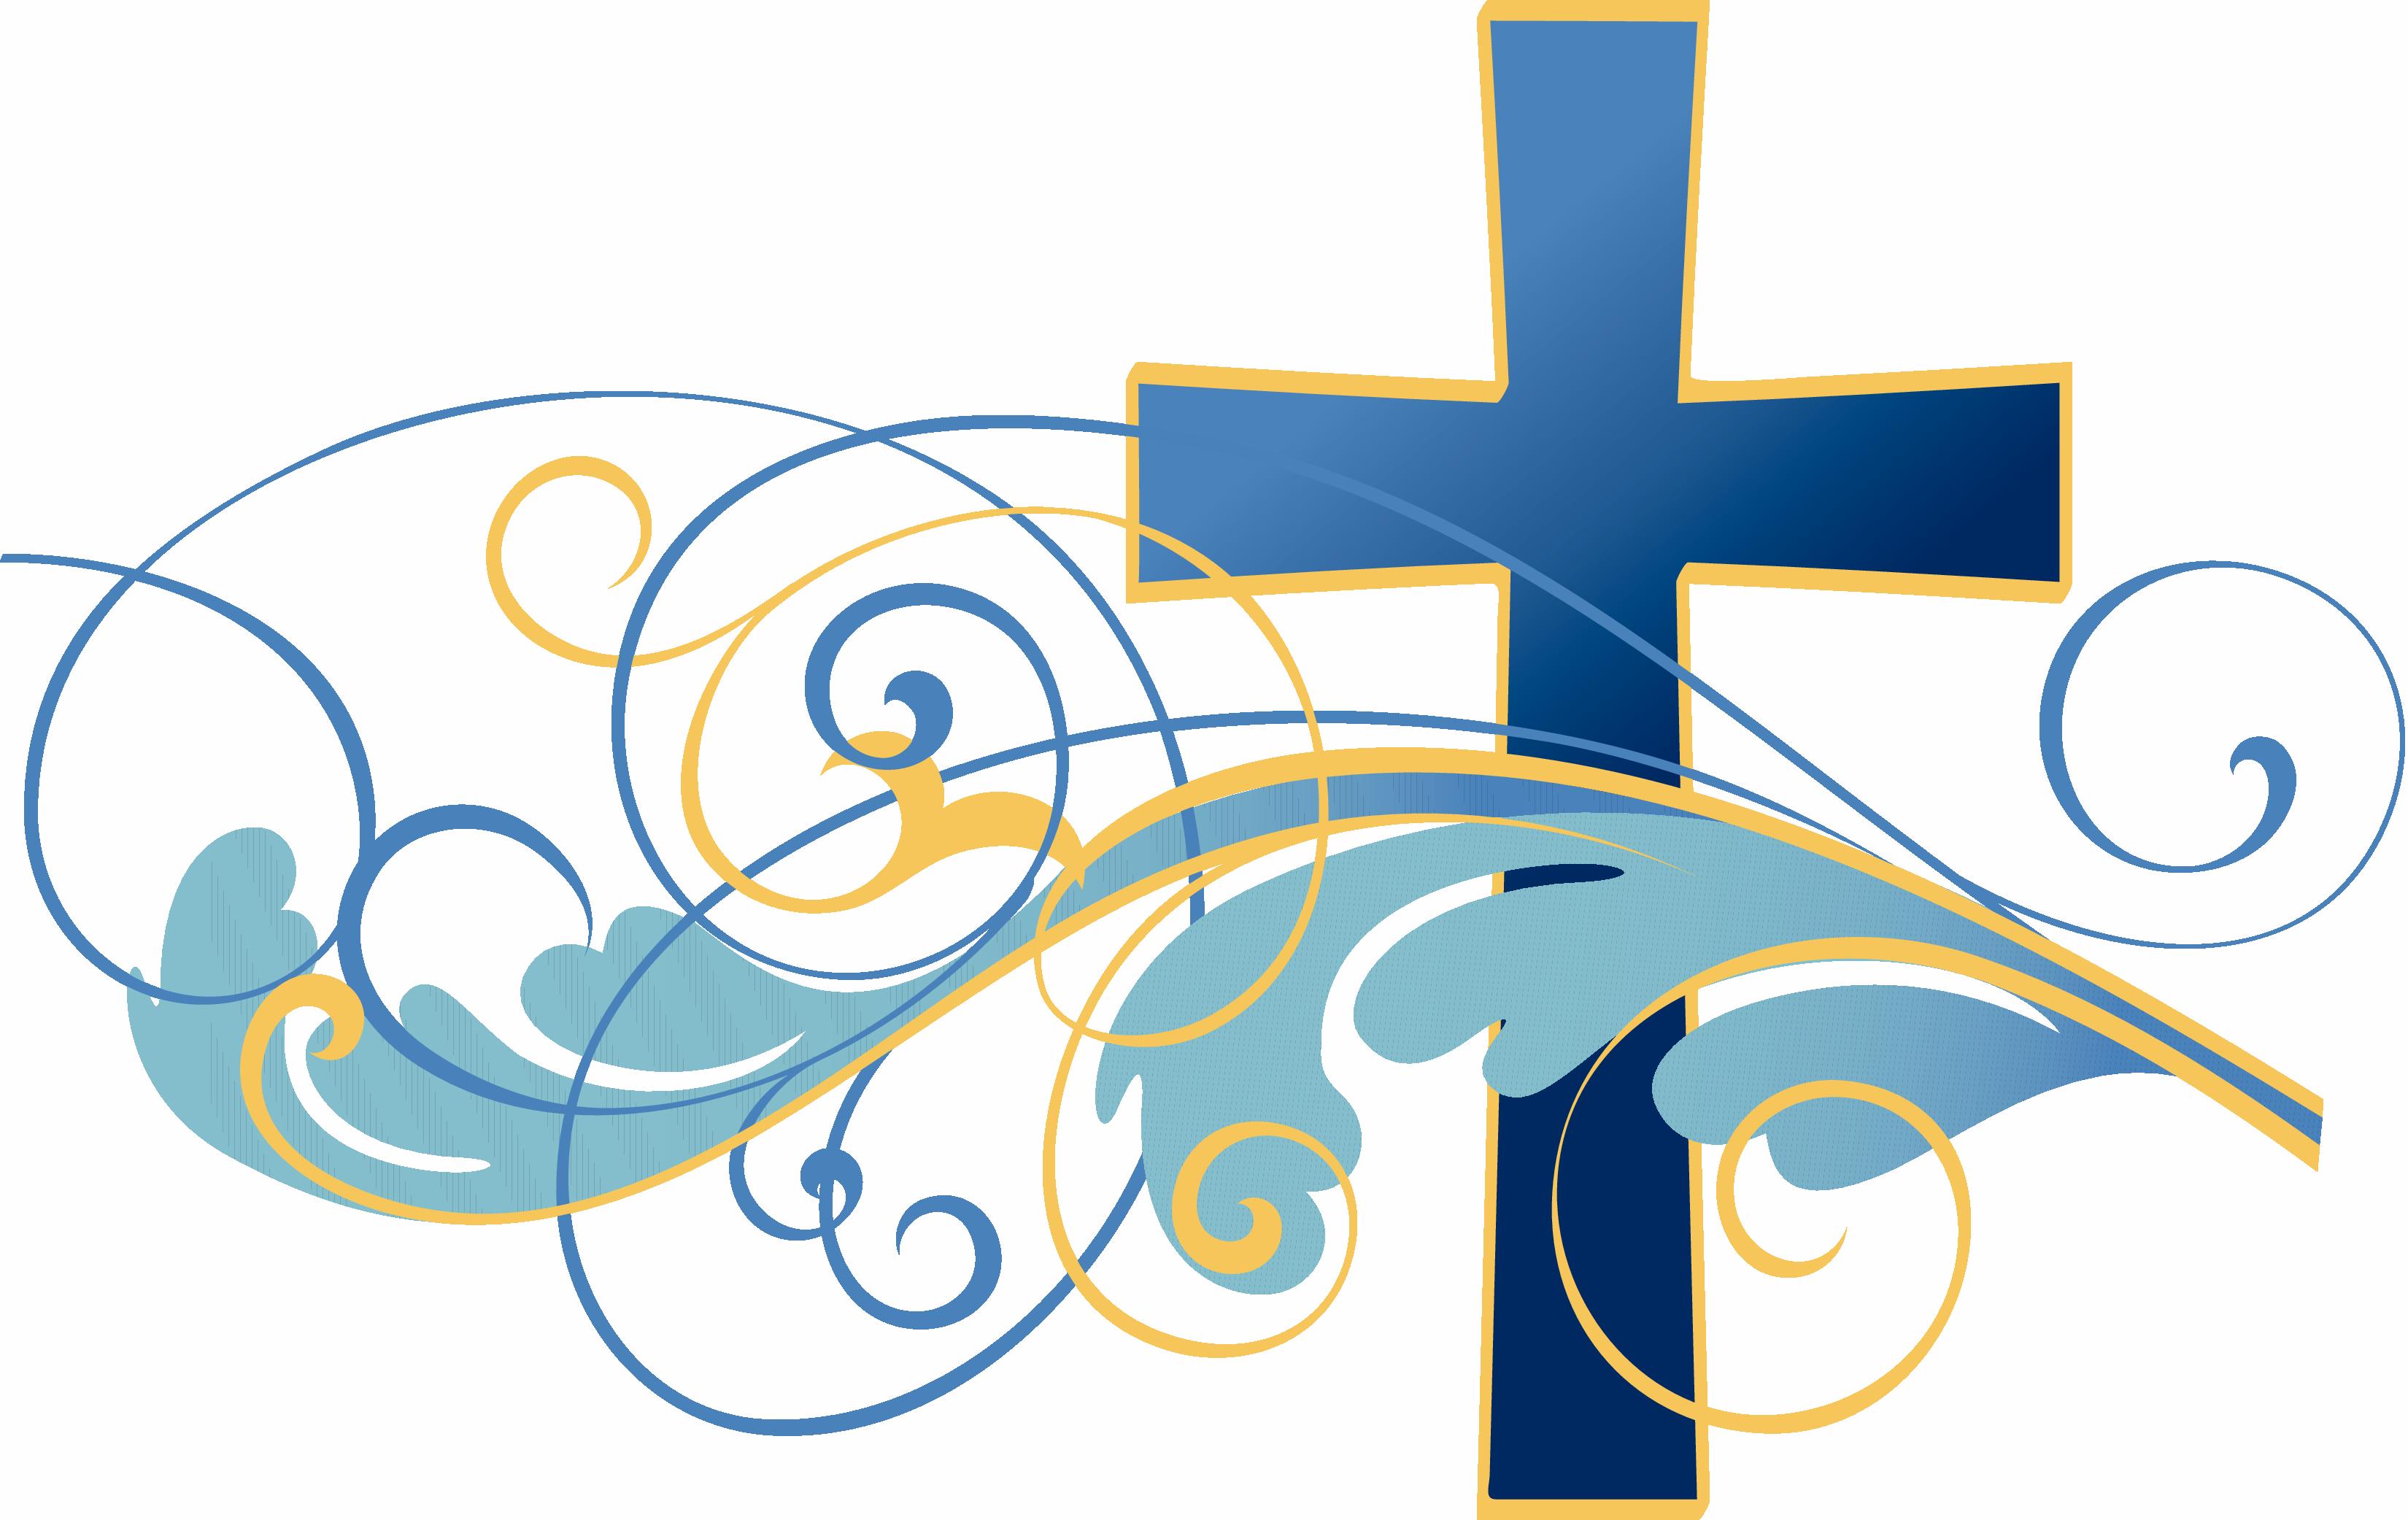 Free Church Anniversary Cliparts, Download Free Clip Art.